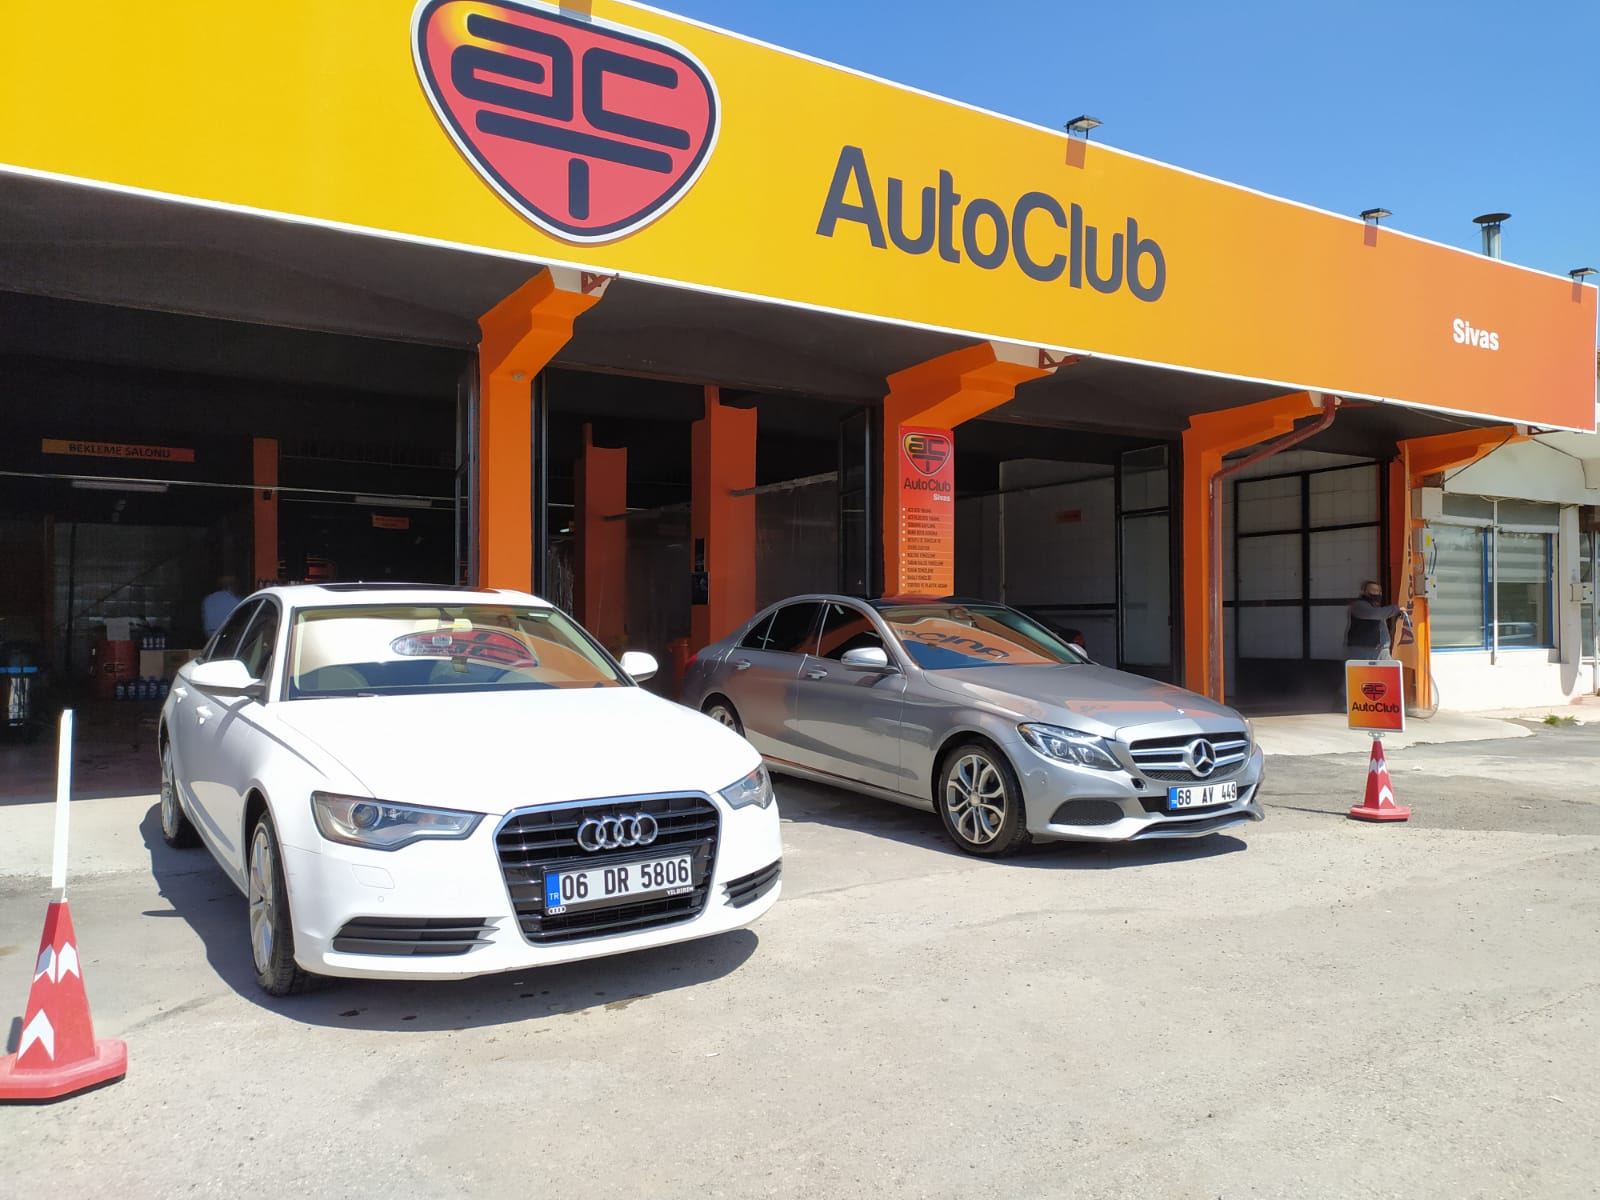 AutoClub Sivas